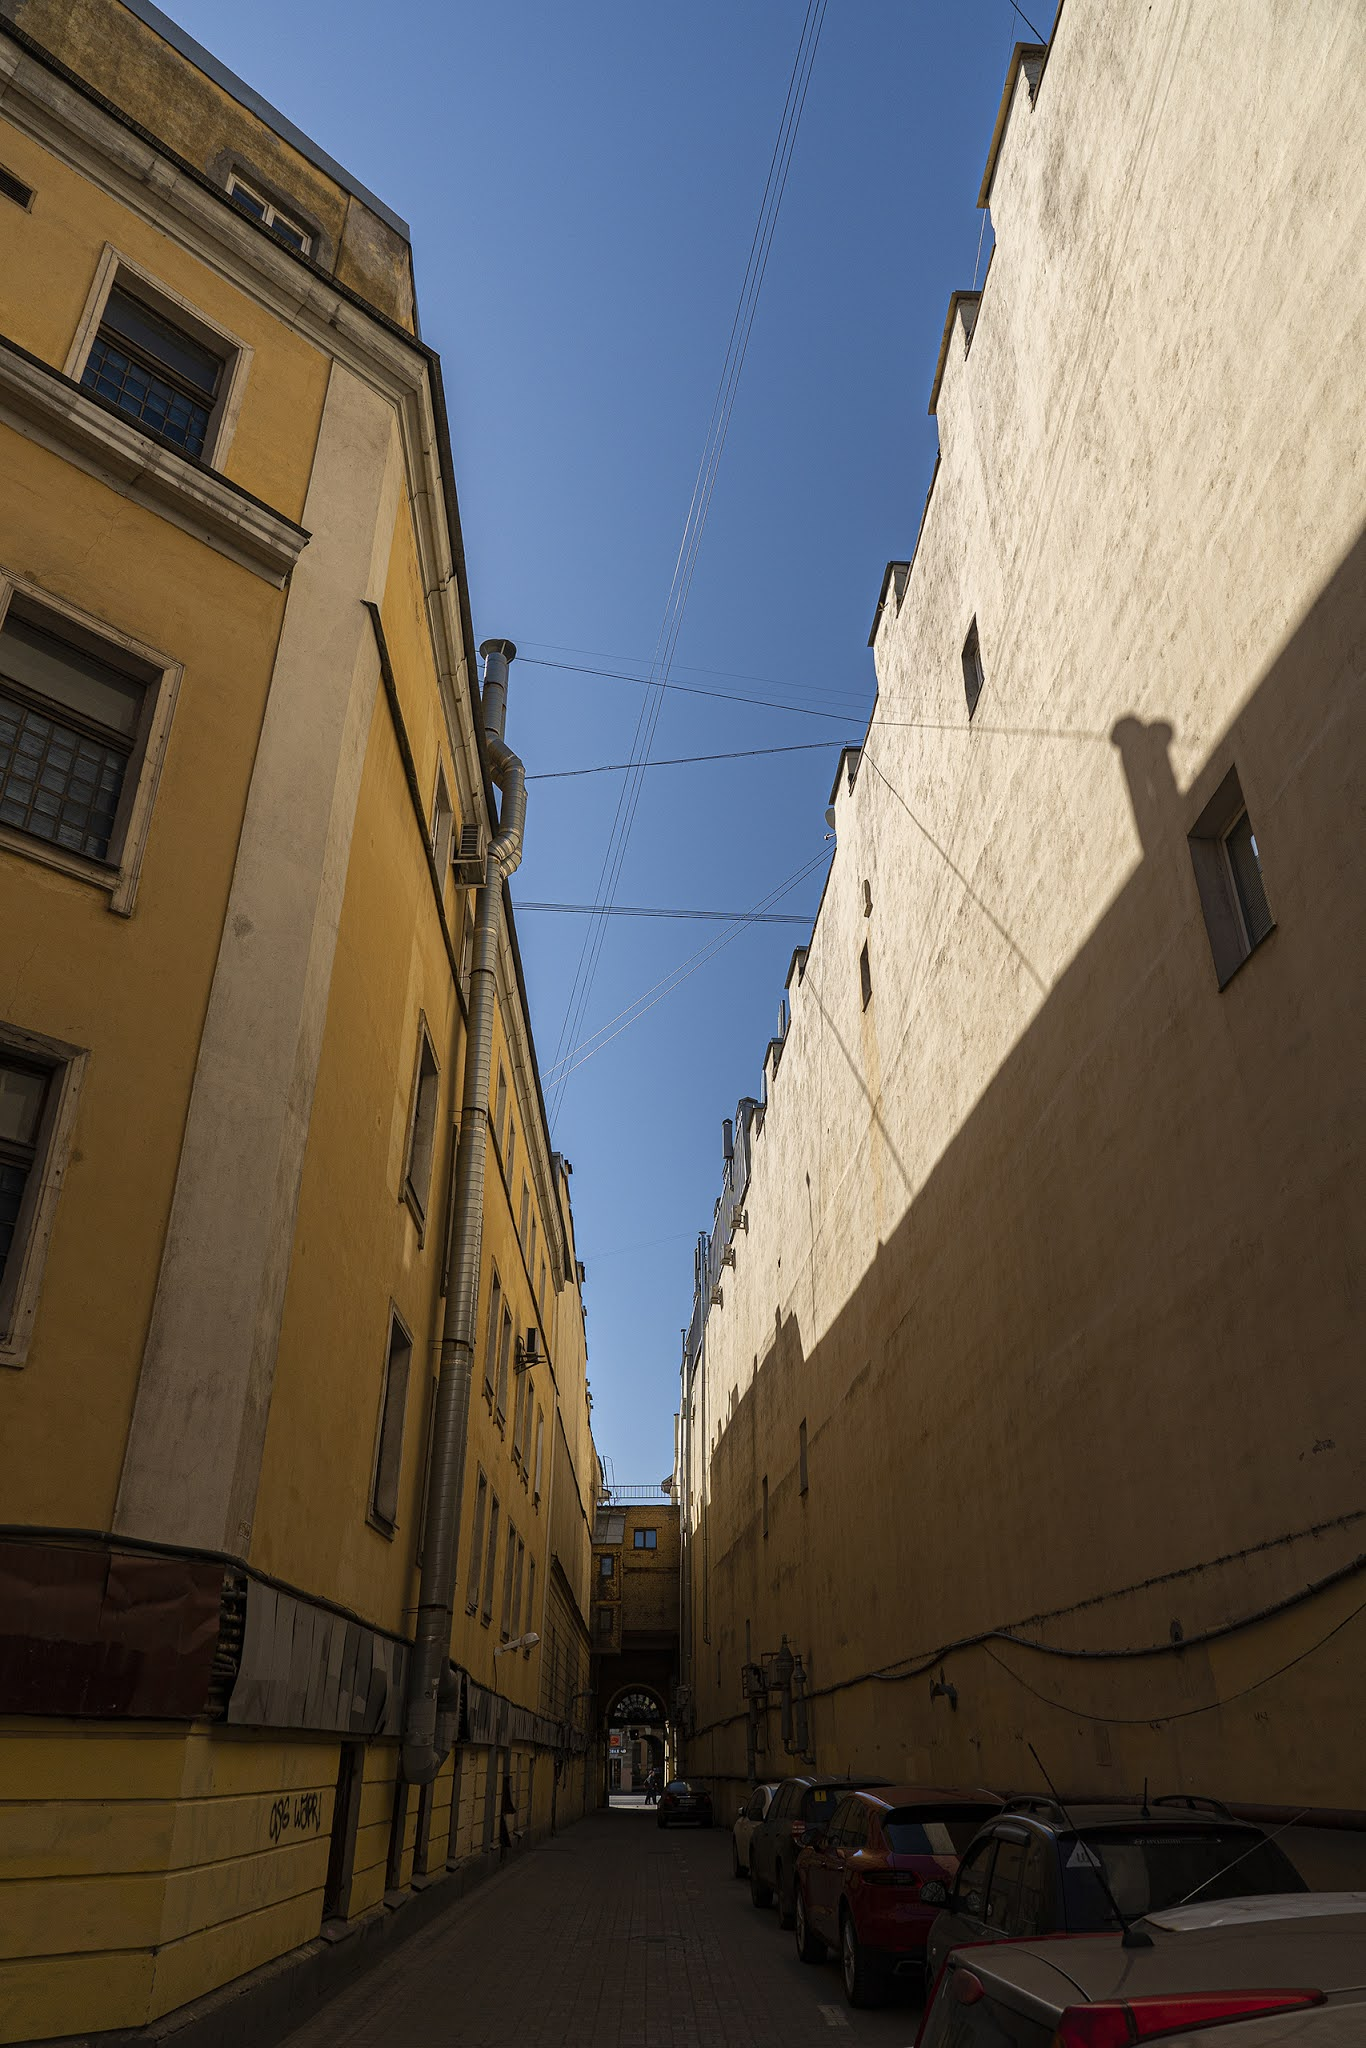 photo by Igor Novik St. Petersburg St. Petersburg yards skyline city streets